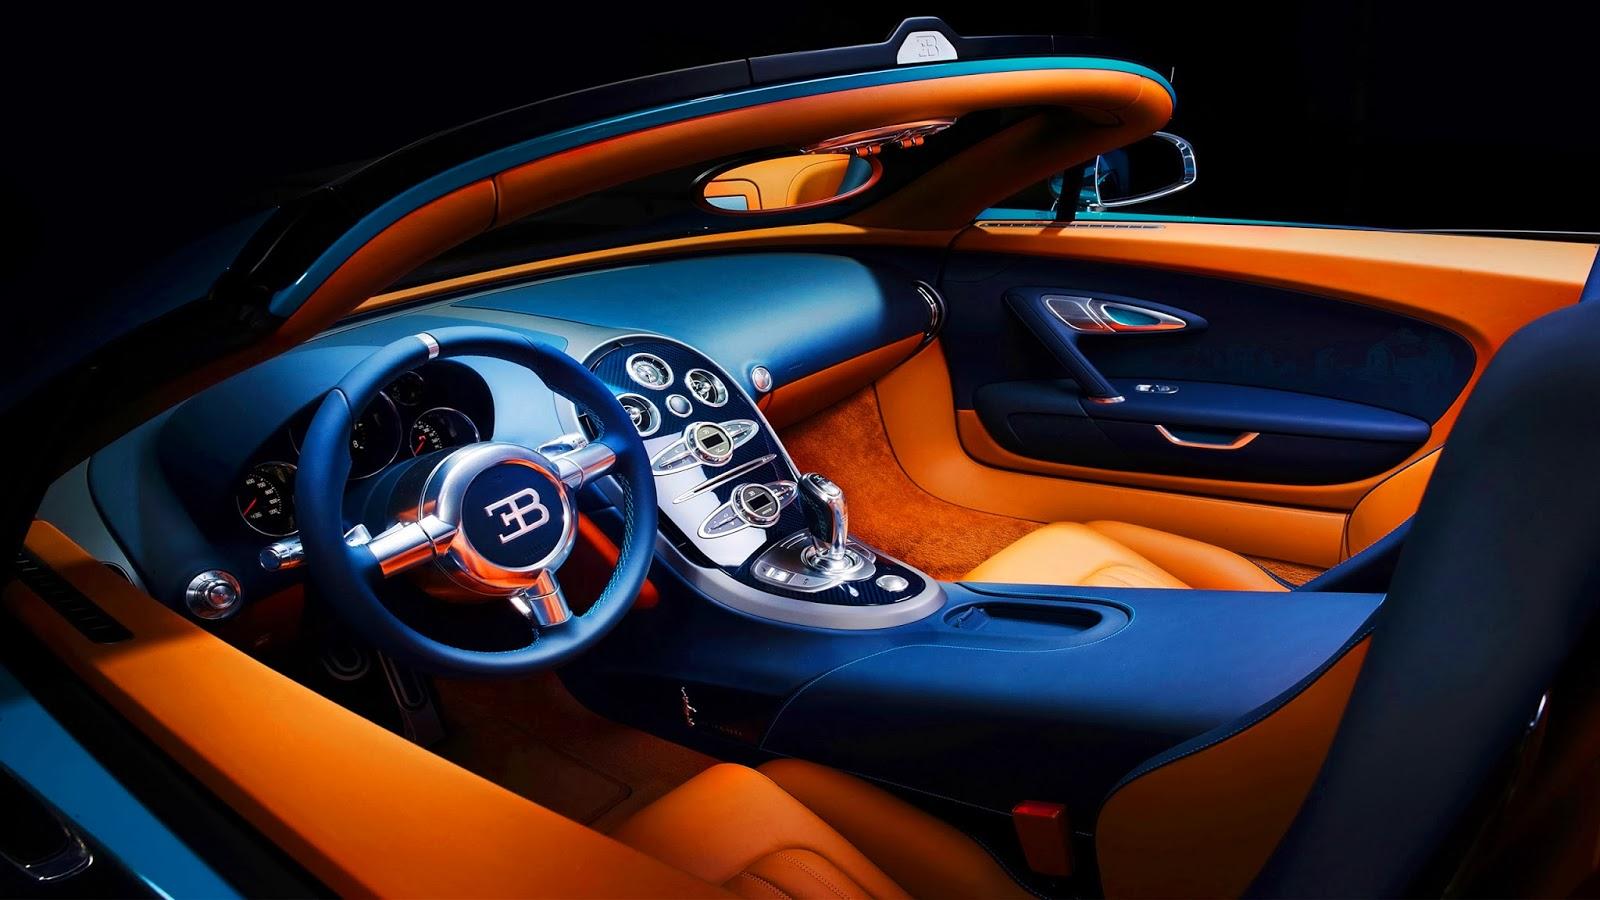 bugatti veyron 16 4 grand sport vitesse legend. Black Bedroom Furniture Sets. Home Design Ideas